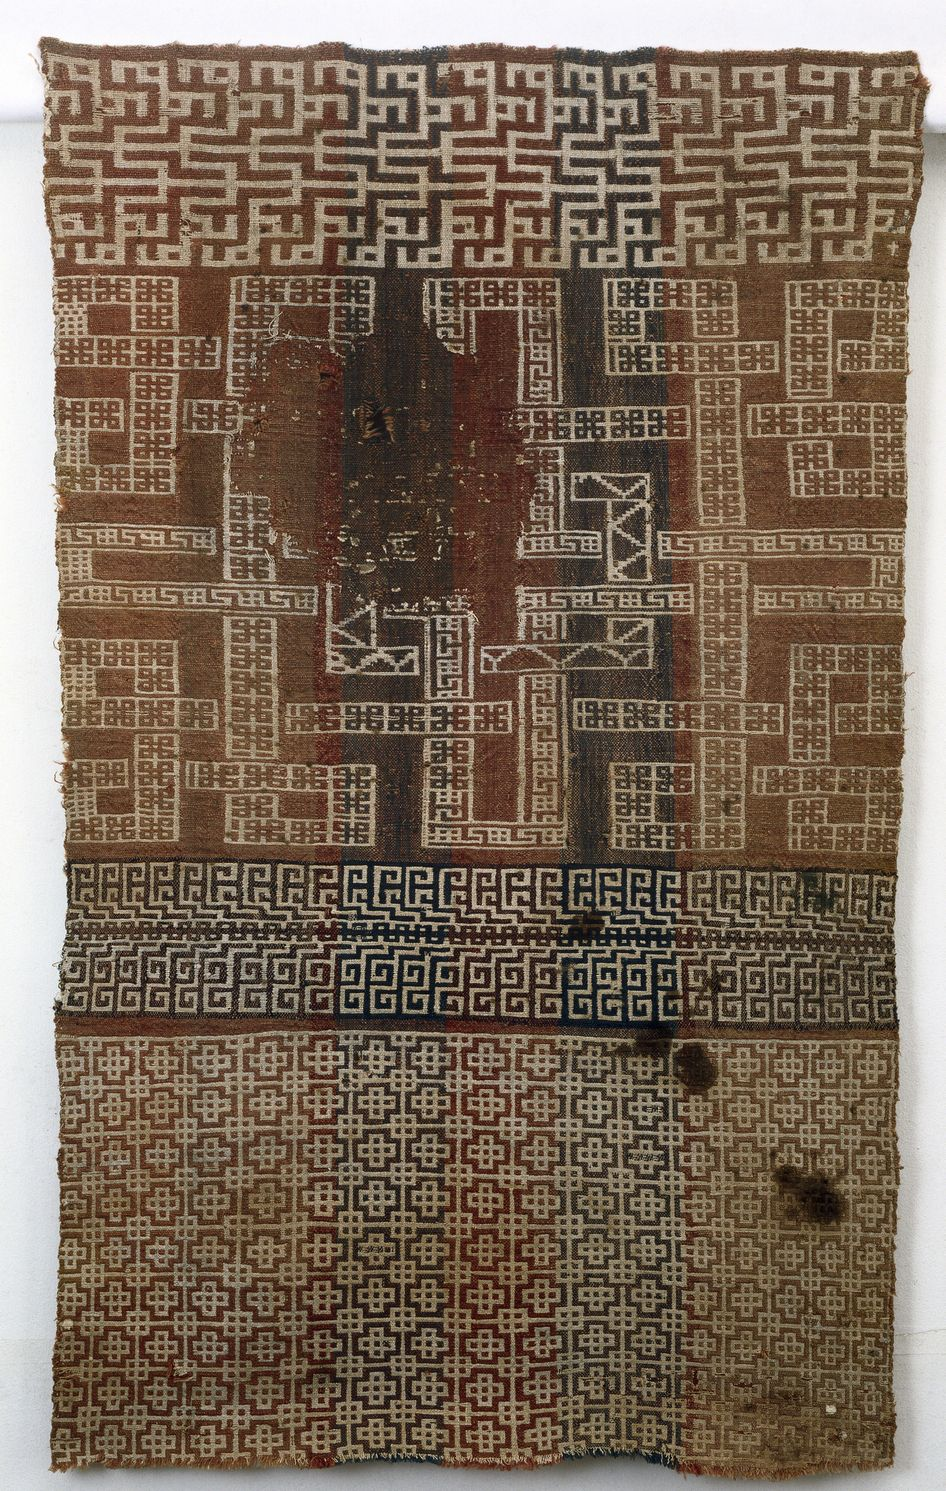 Srep02686 F3 Jpg 946 1491 Scandinavian Textiles Vikings Medieval Embroidery